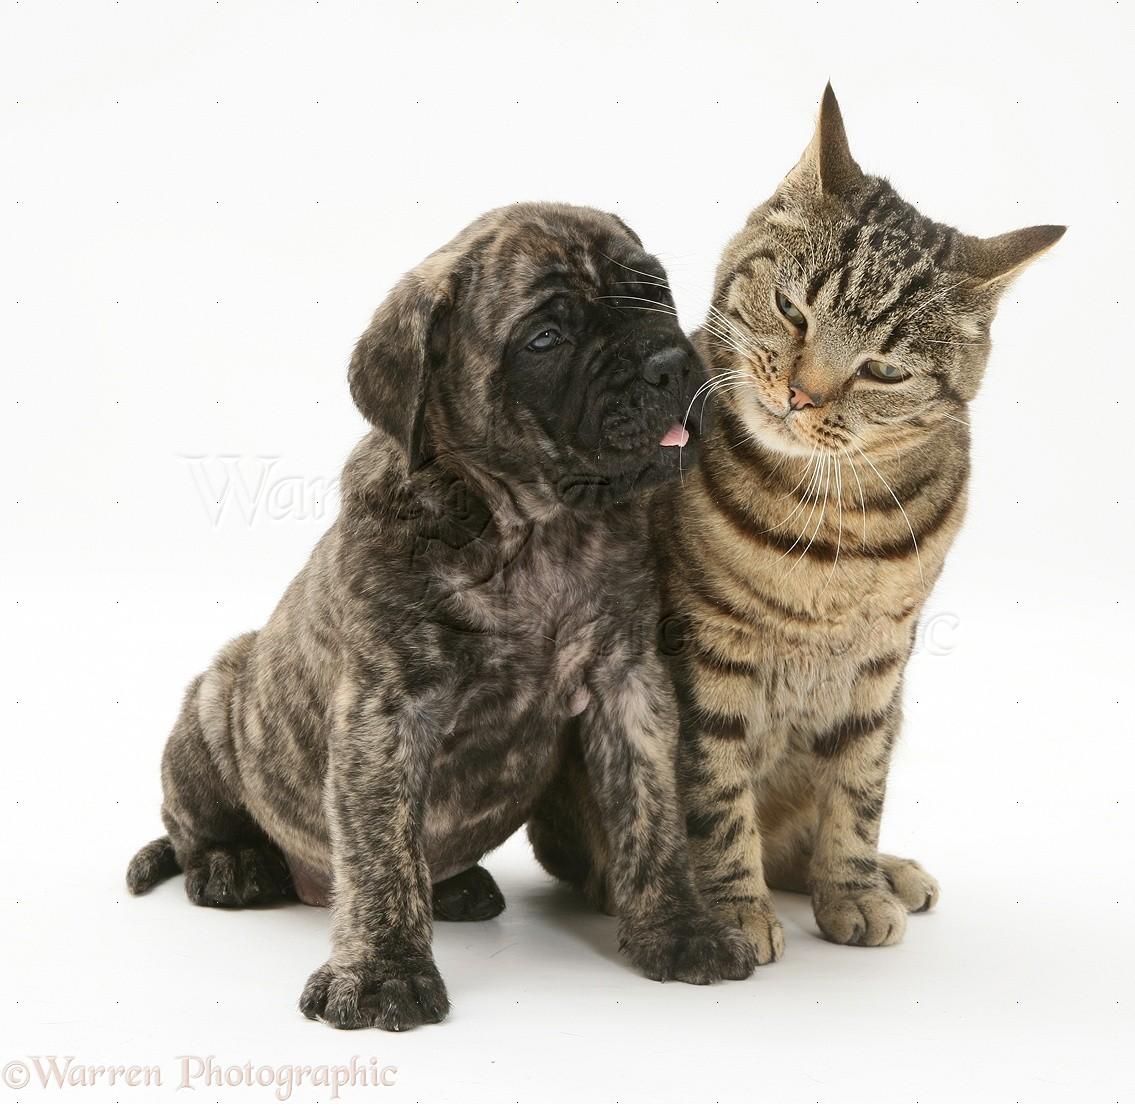 Pets: Brindle English Mastiff pup with tabby cat photo - WP22481